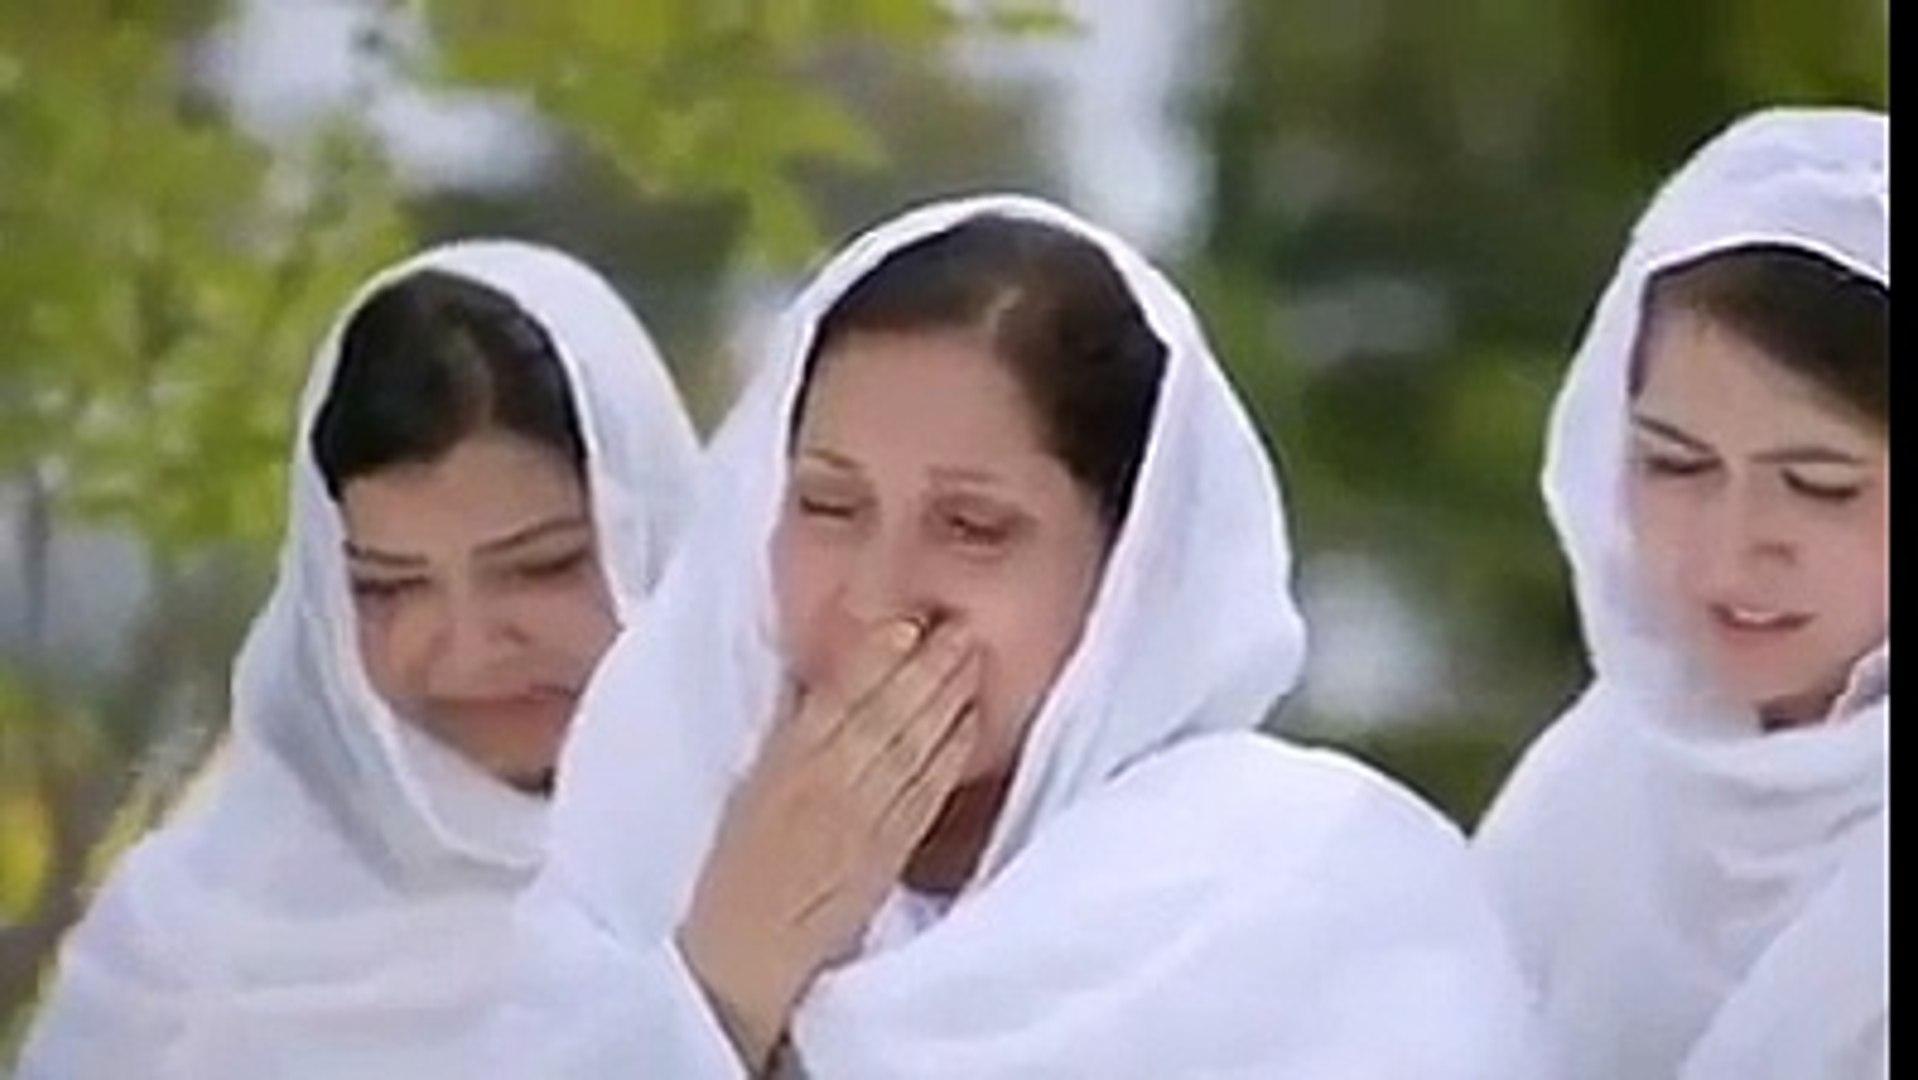 Rahat fateh ali khan national songs 2017 - Pakistan  Mili Nagmas 2017- ISPR New Nagma 2017